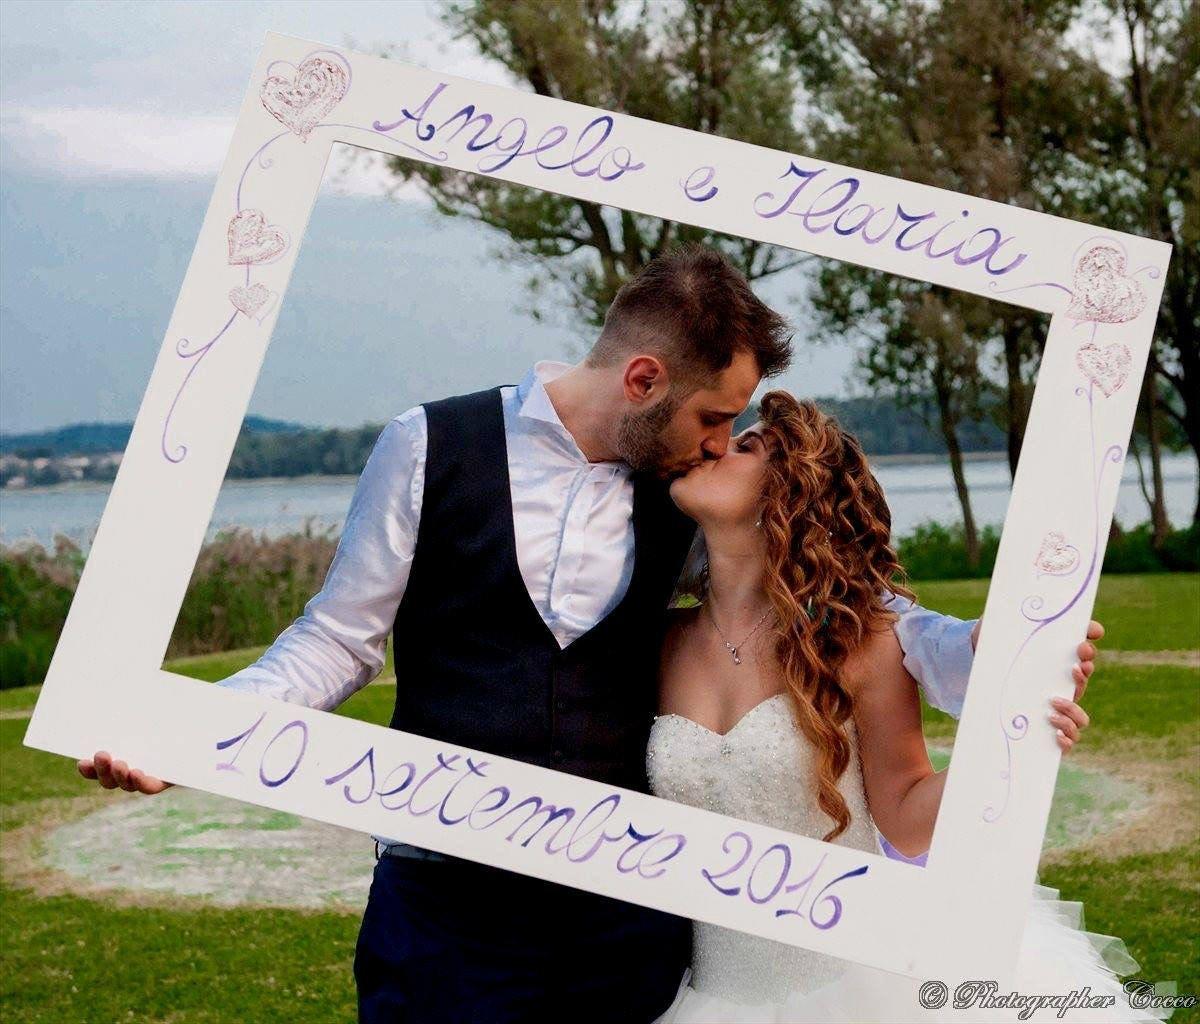 Fabriquer photomaton mariage - Cadre photo mariage personnalise ...